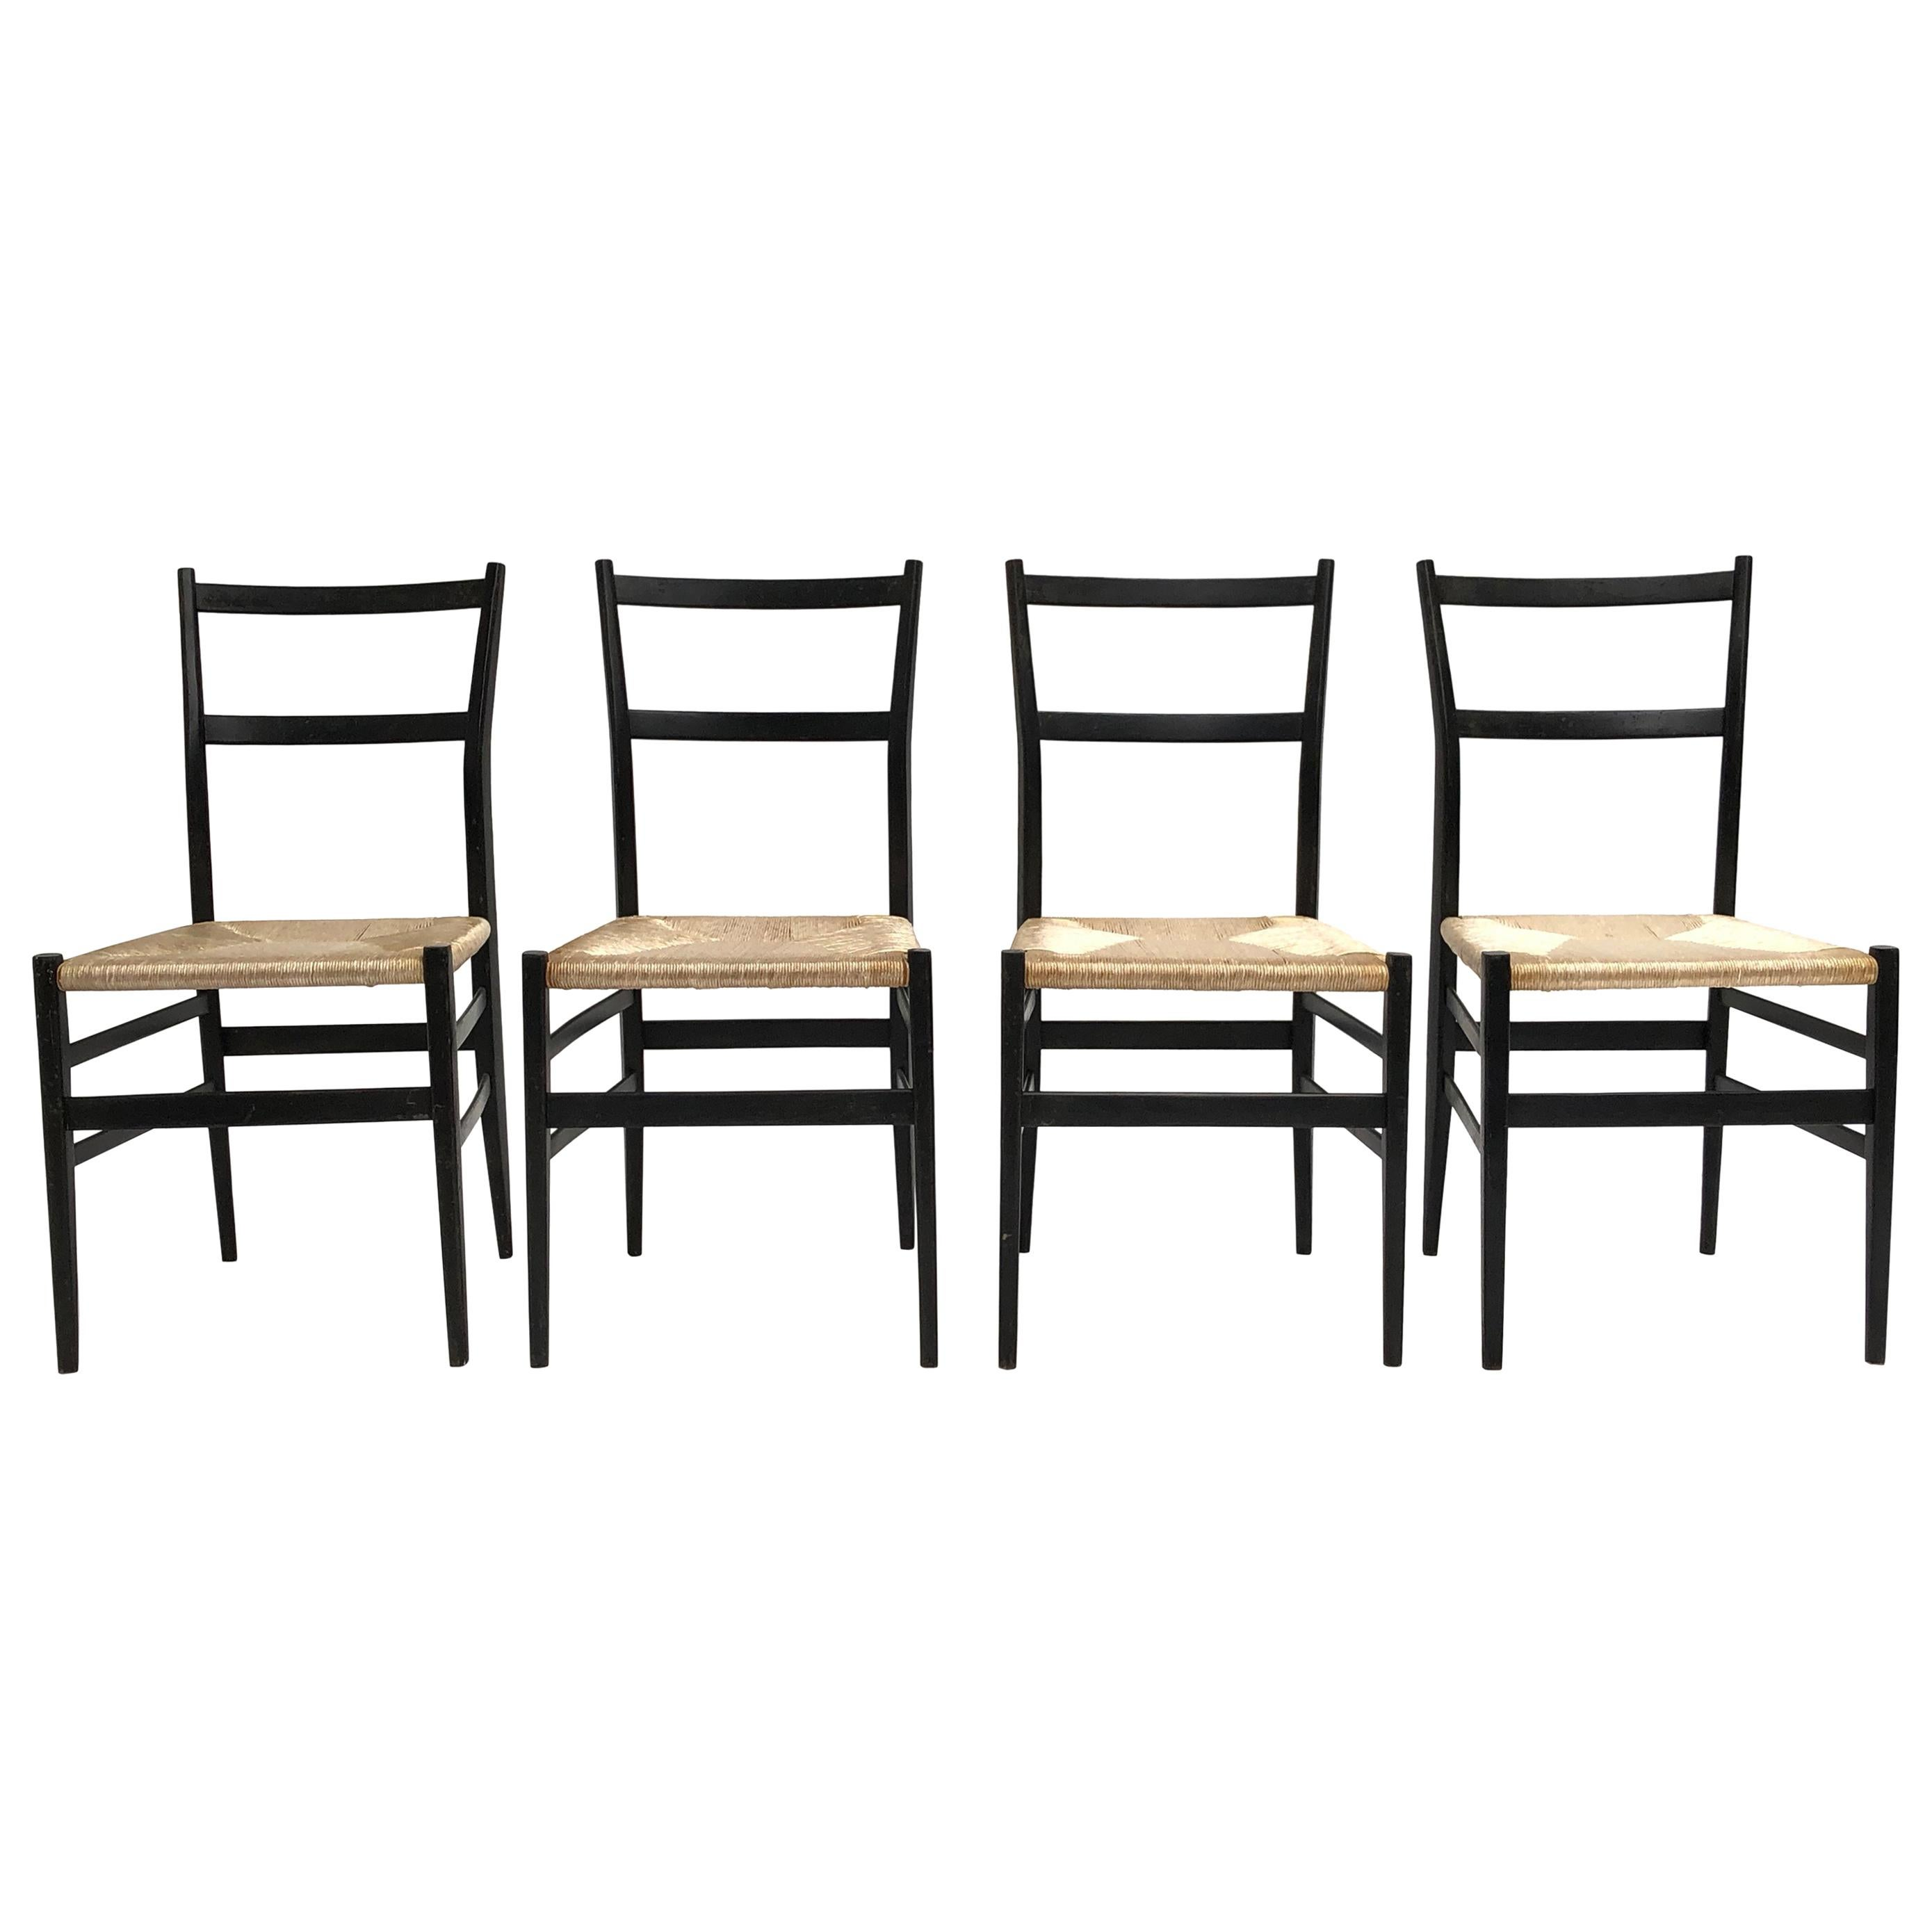 Set of 4 Leggera Black Ebonized Wooden Dining Chairs by Gio Ponti, Italy, 1950s